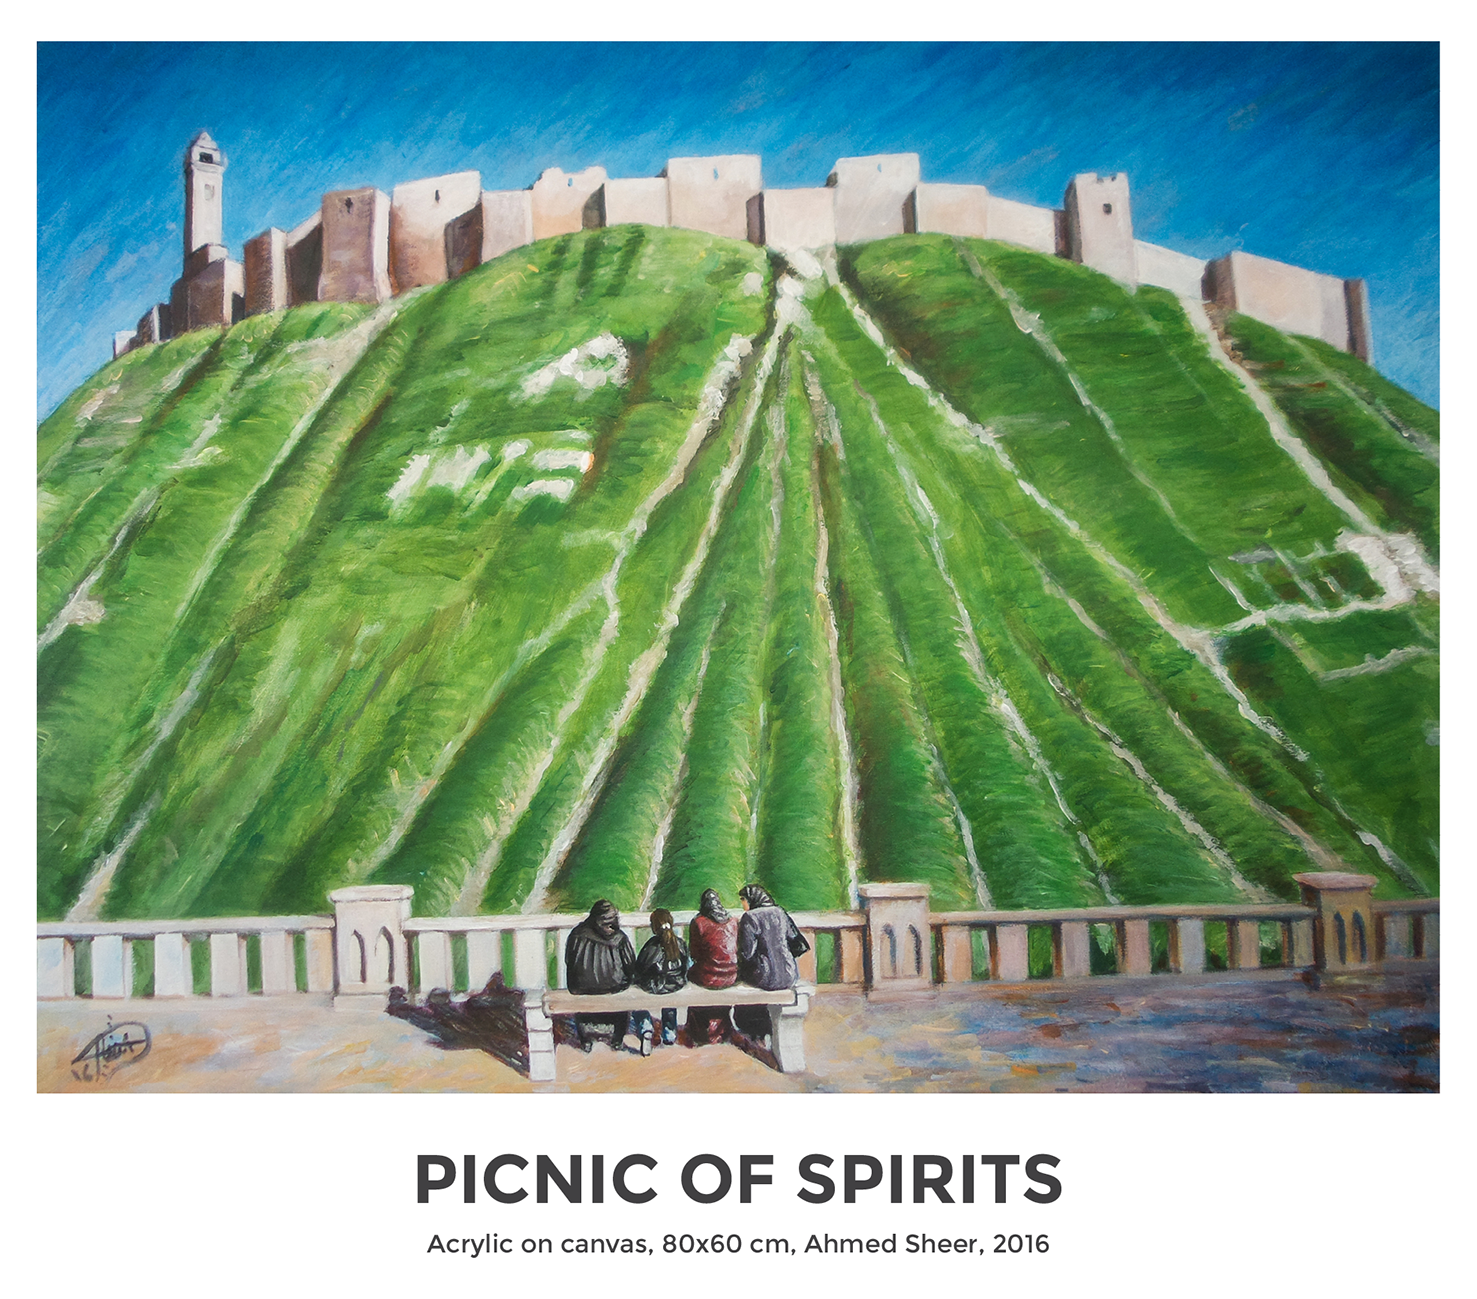 Picnic of Spirits